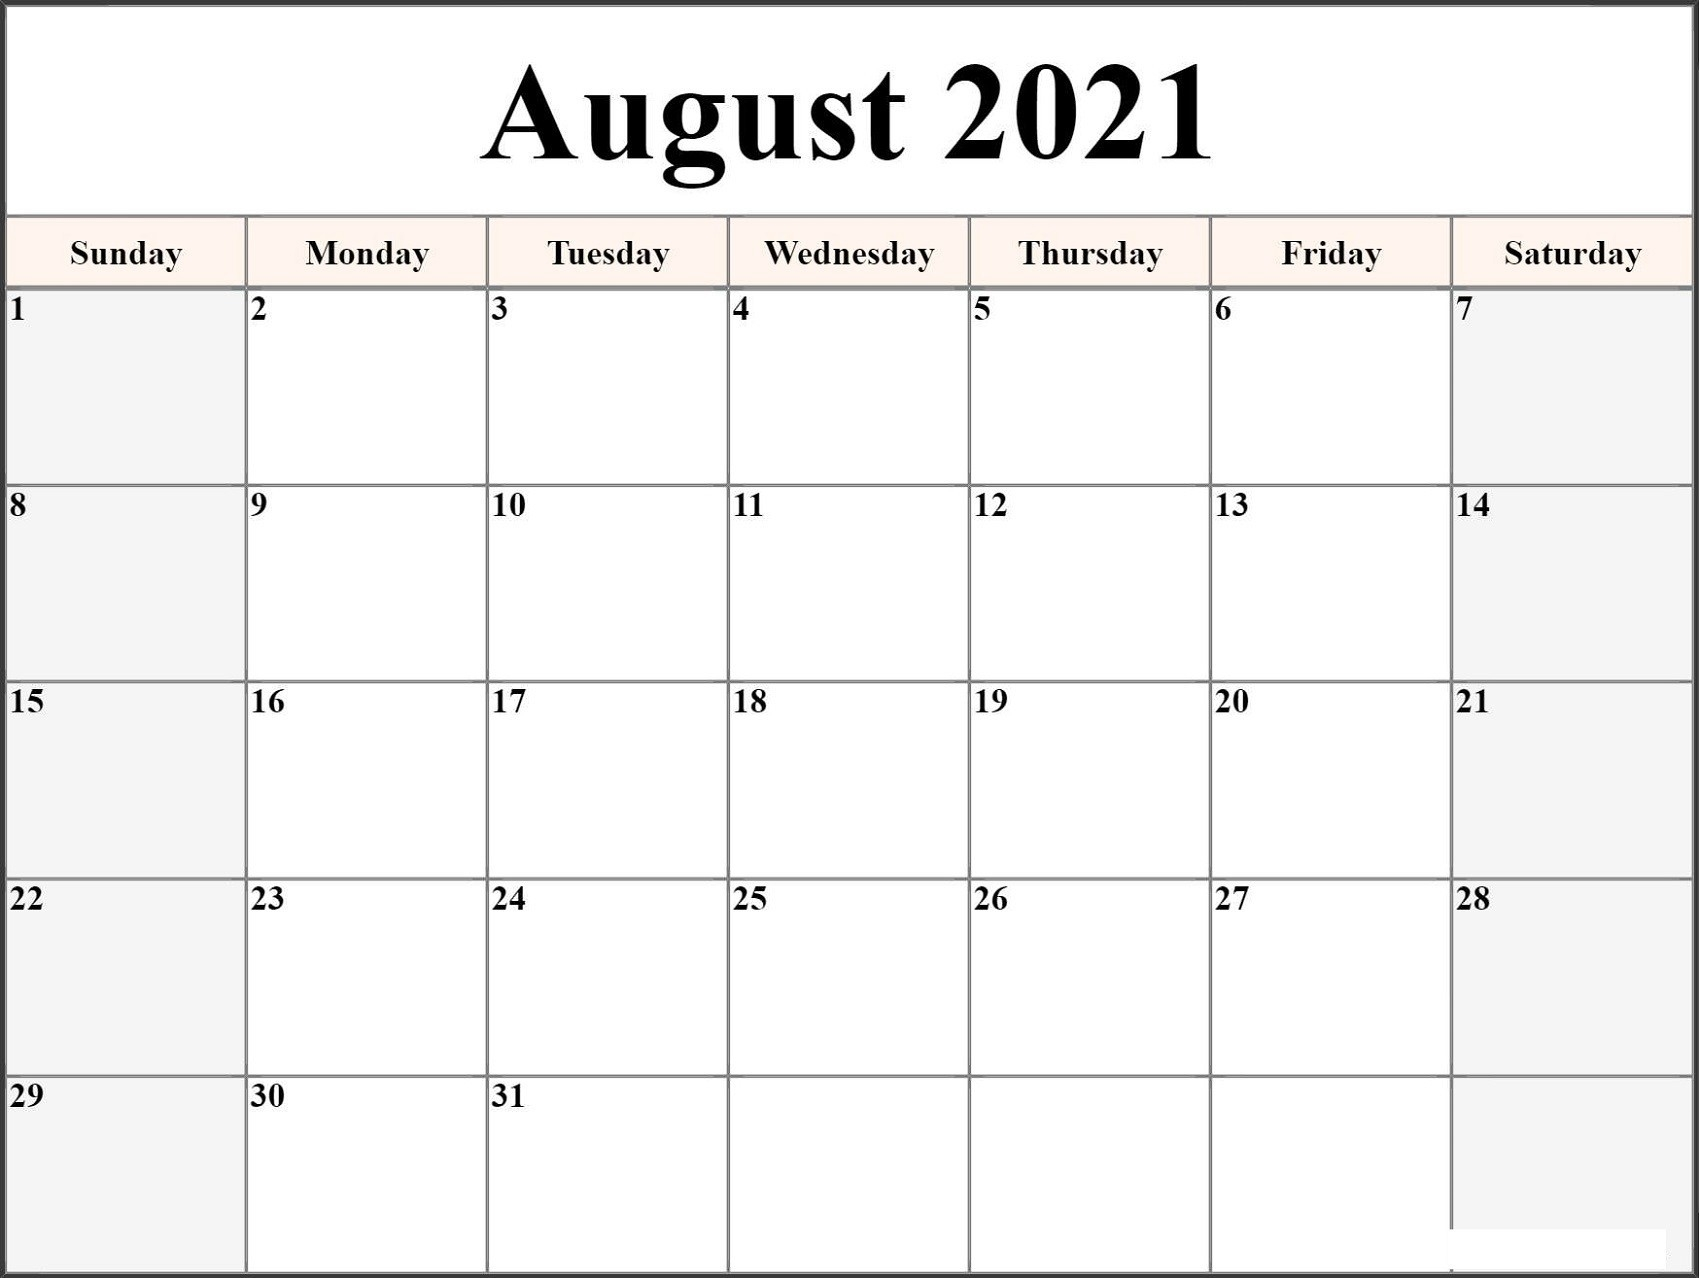 Microsoft Word Calendar Template 2021 Monthly | Free-2021 Monthly Calendar Template Word